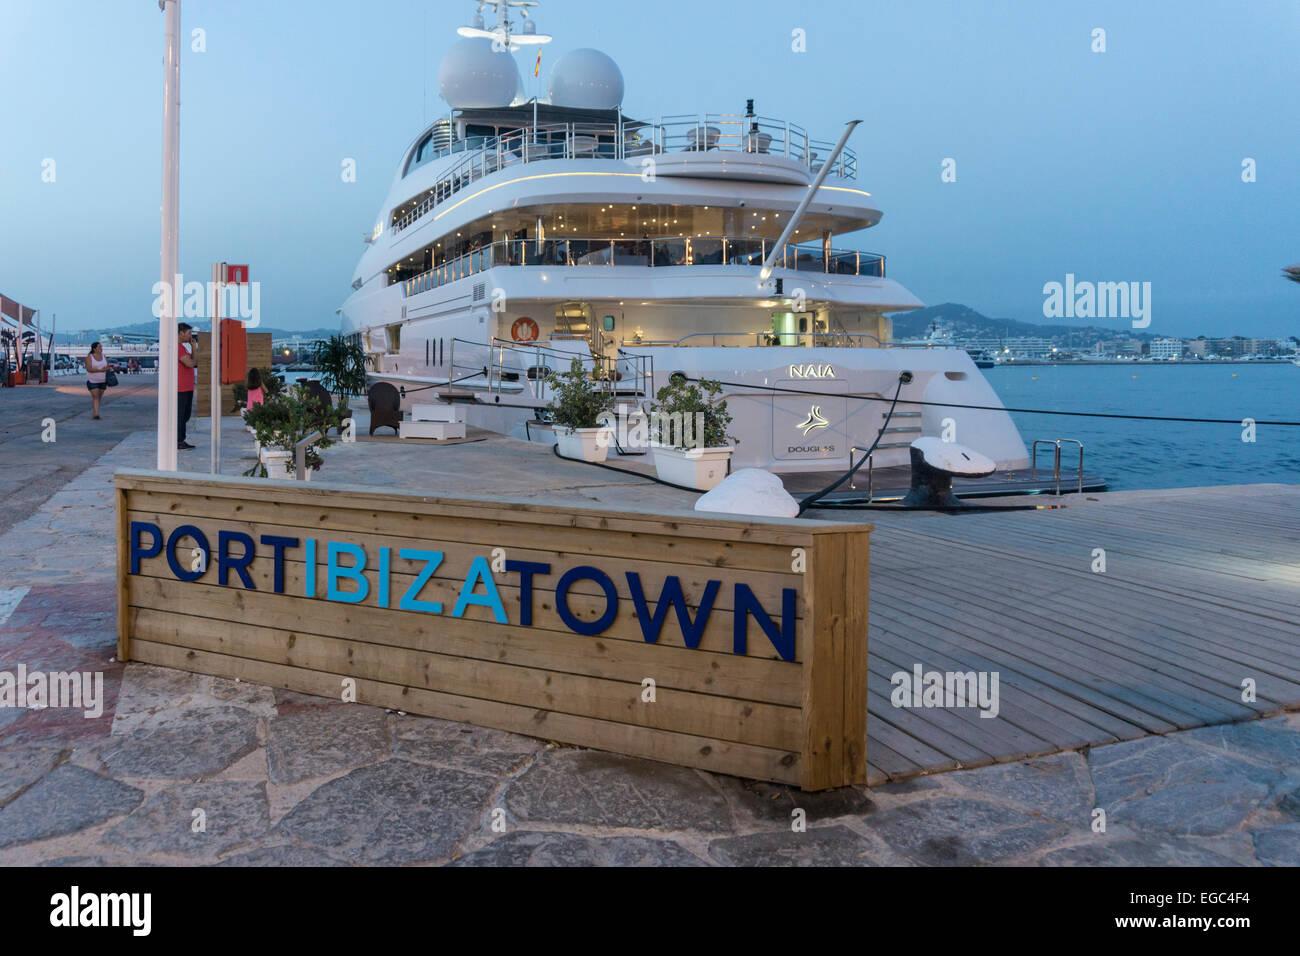 Port Ibiza town, Luxery Charter Yacht, Ibiza, Spain - Stock Image